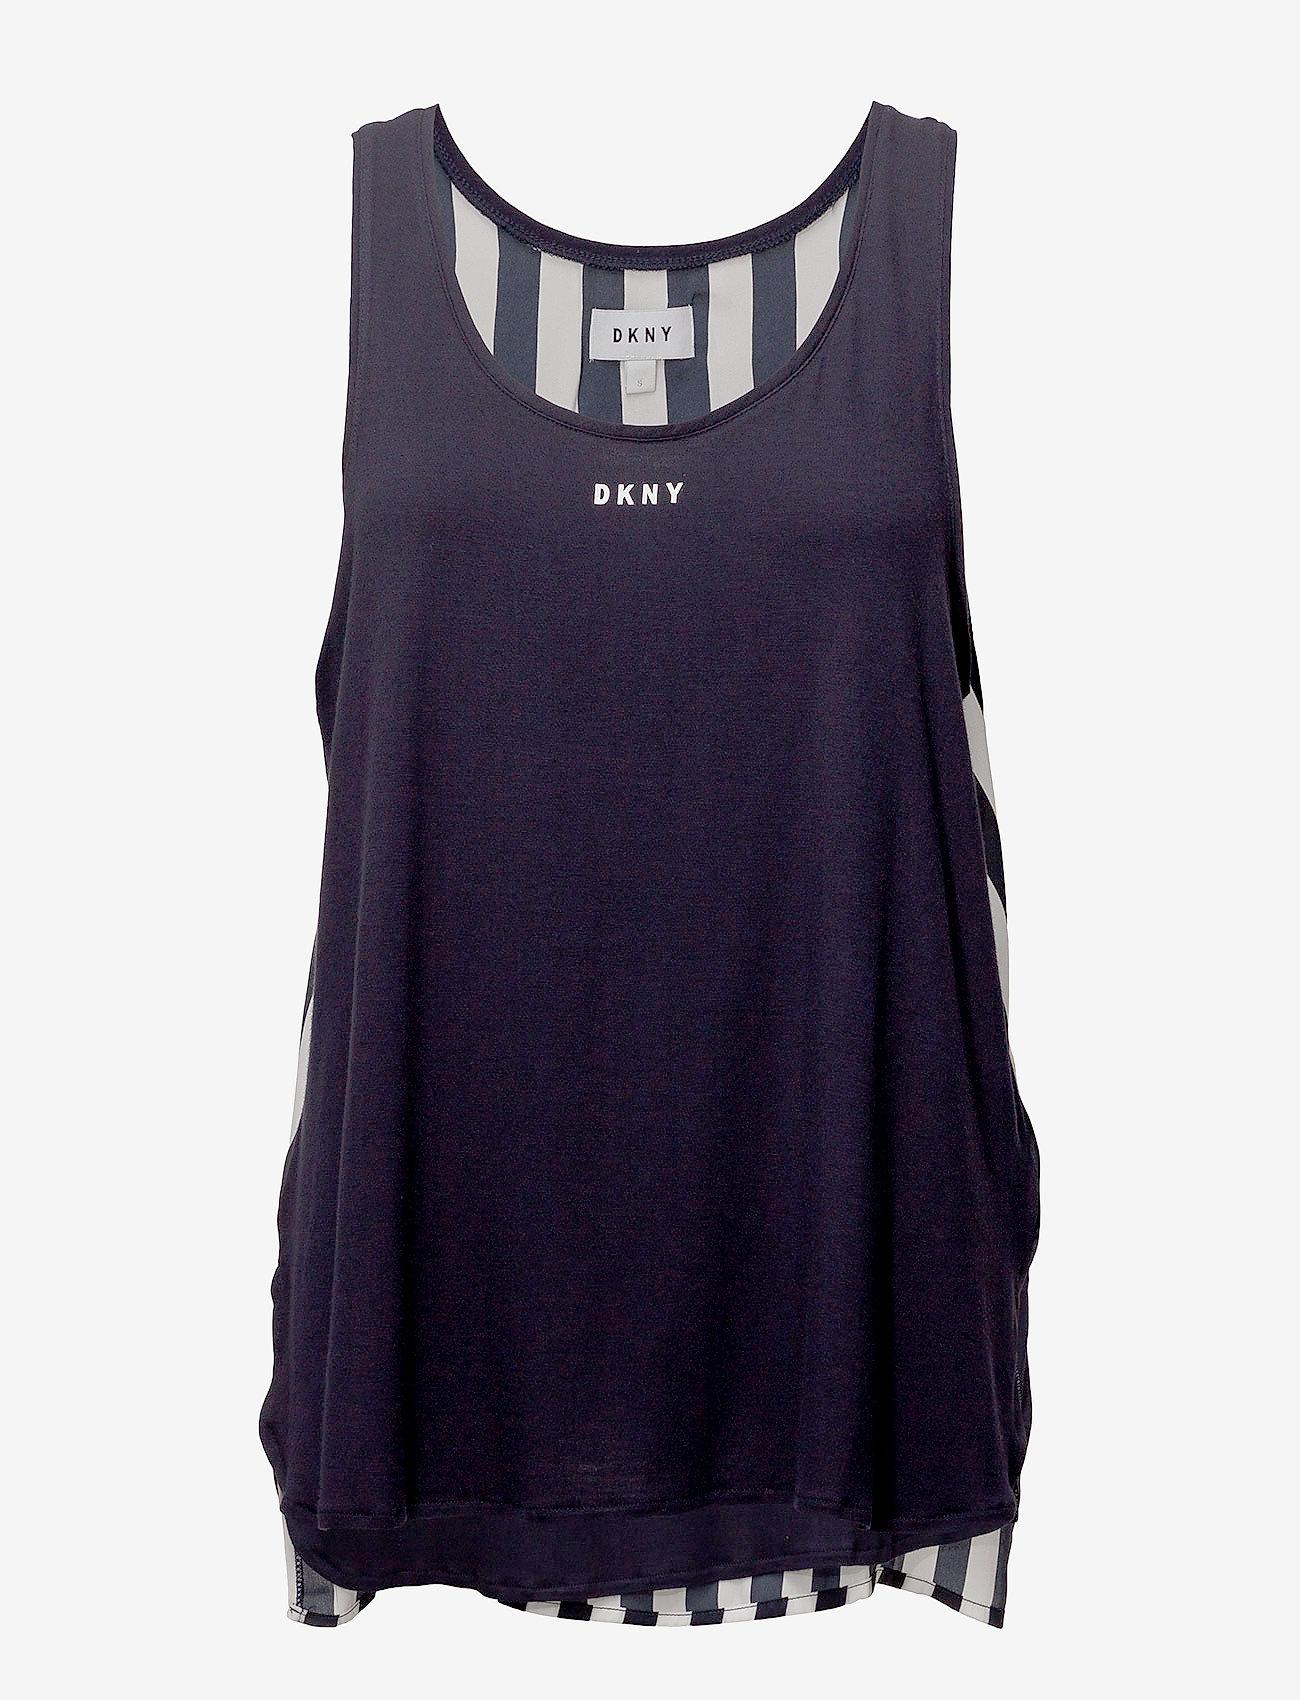 DKNY Homewear - DKNY WALK THE LINE TANK - oberteile - navy - 0